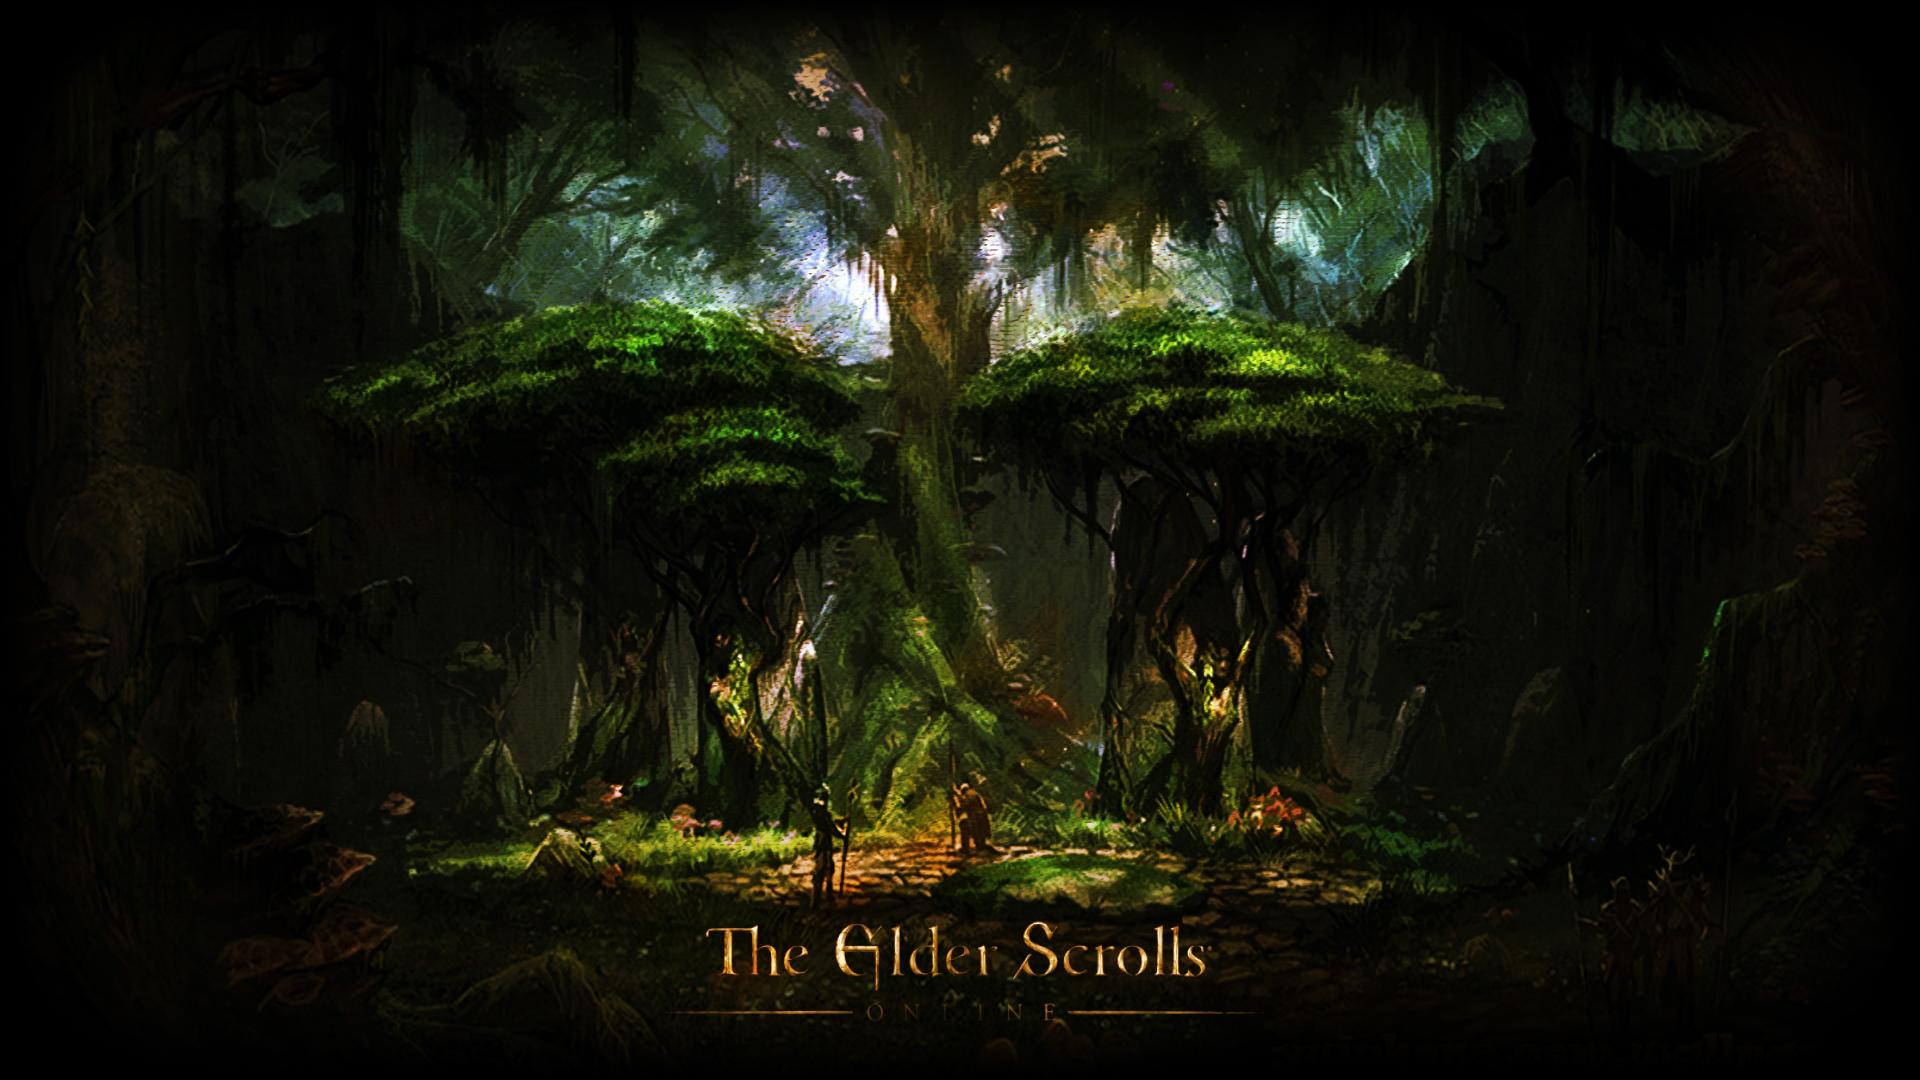 Elder scrolls online wallpaper 1920x1080